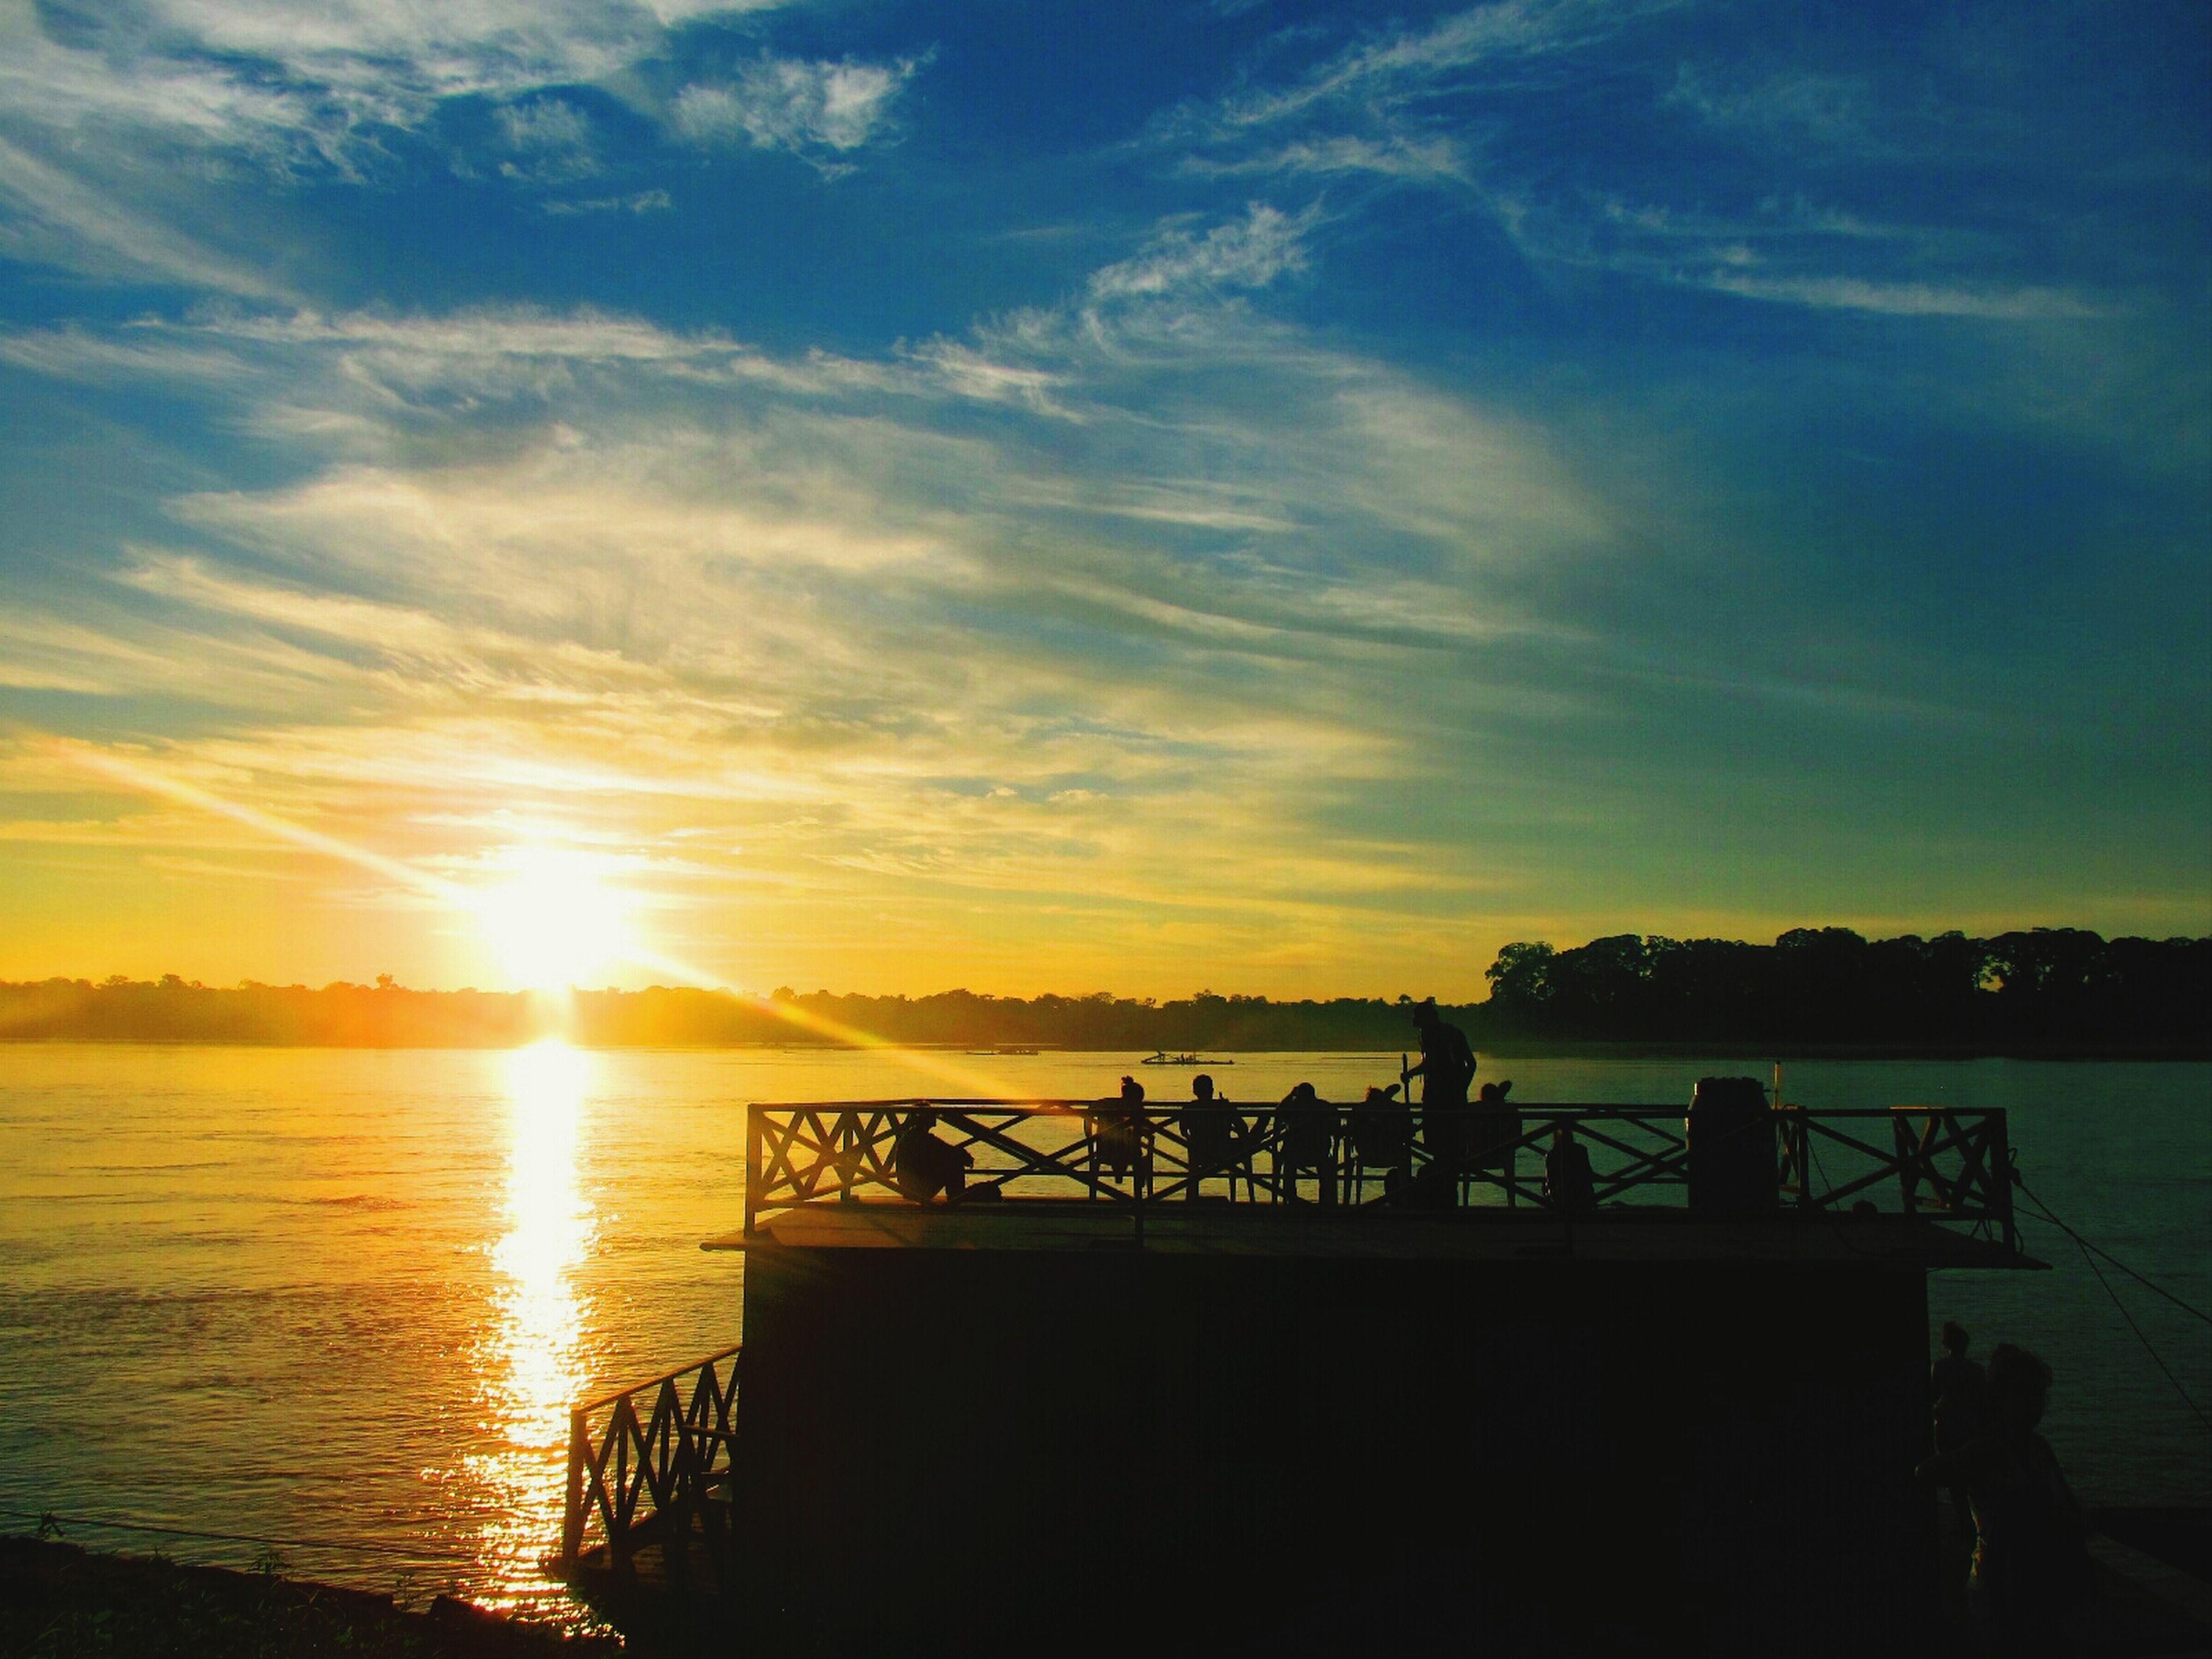 sunset, silhouette, water, sun, scenics, tranquil scene, sky, beauty in nature, tranquility, orange color, sea, nature, reflection, idyllic, sunlight, cloud - sky, horizon over water, sunbeam, men